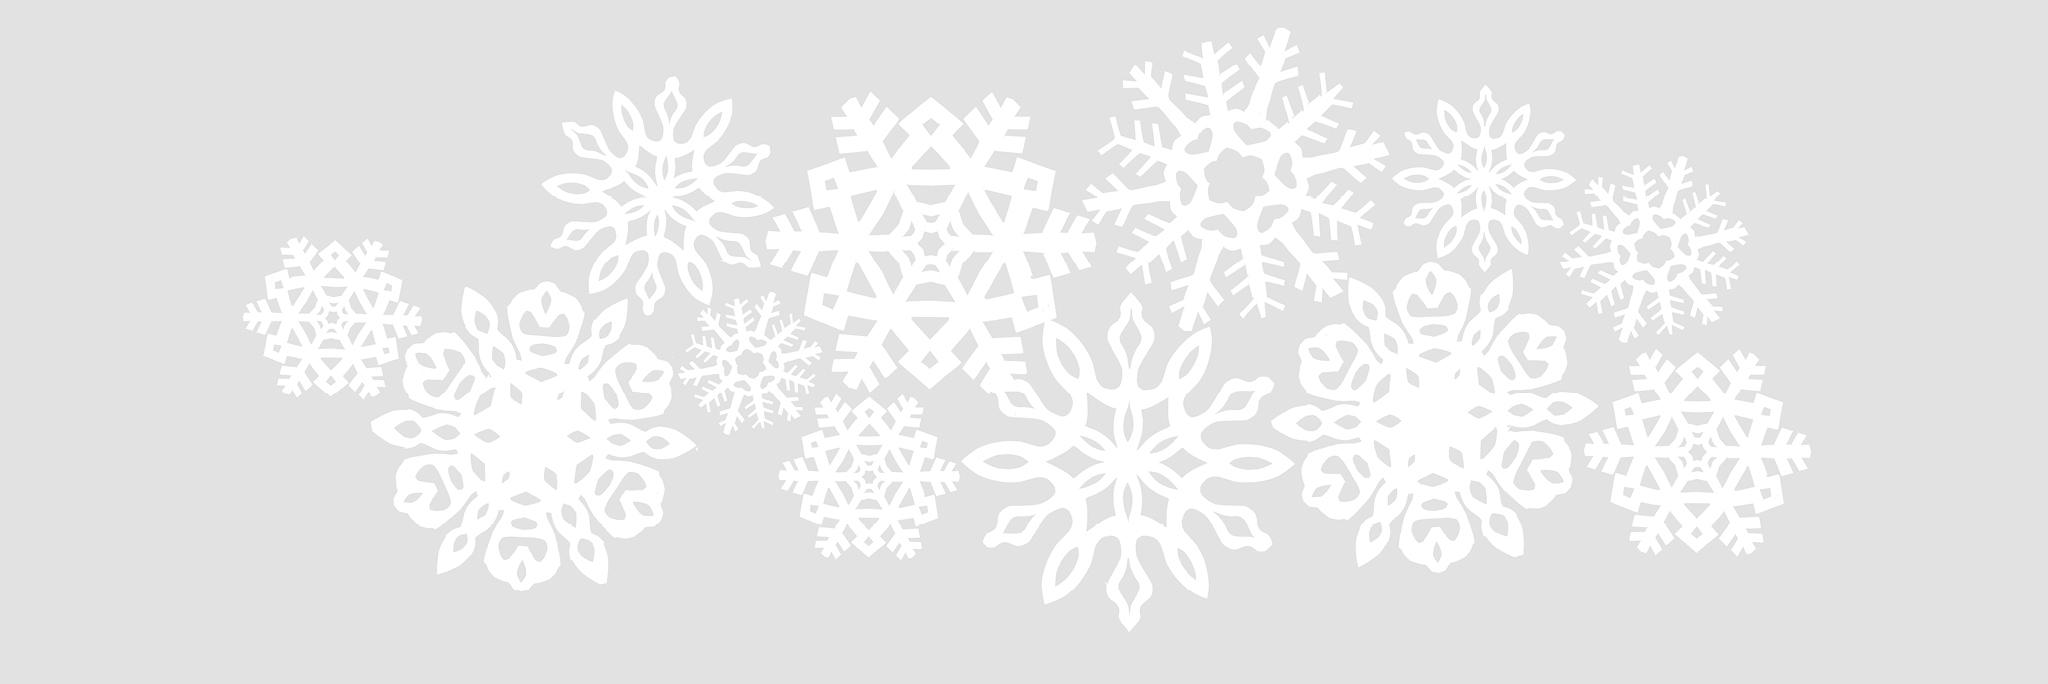 Final snowflake design | Spoonflower Blog